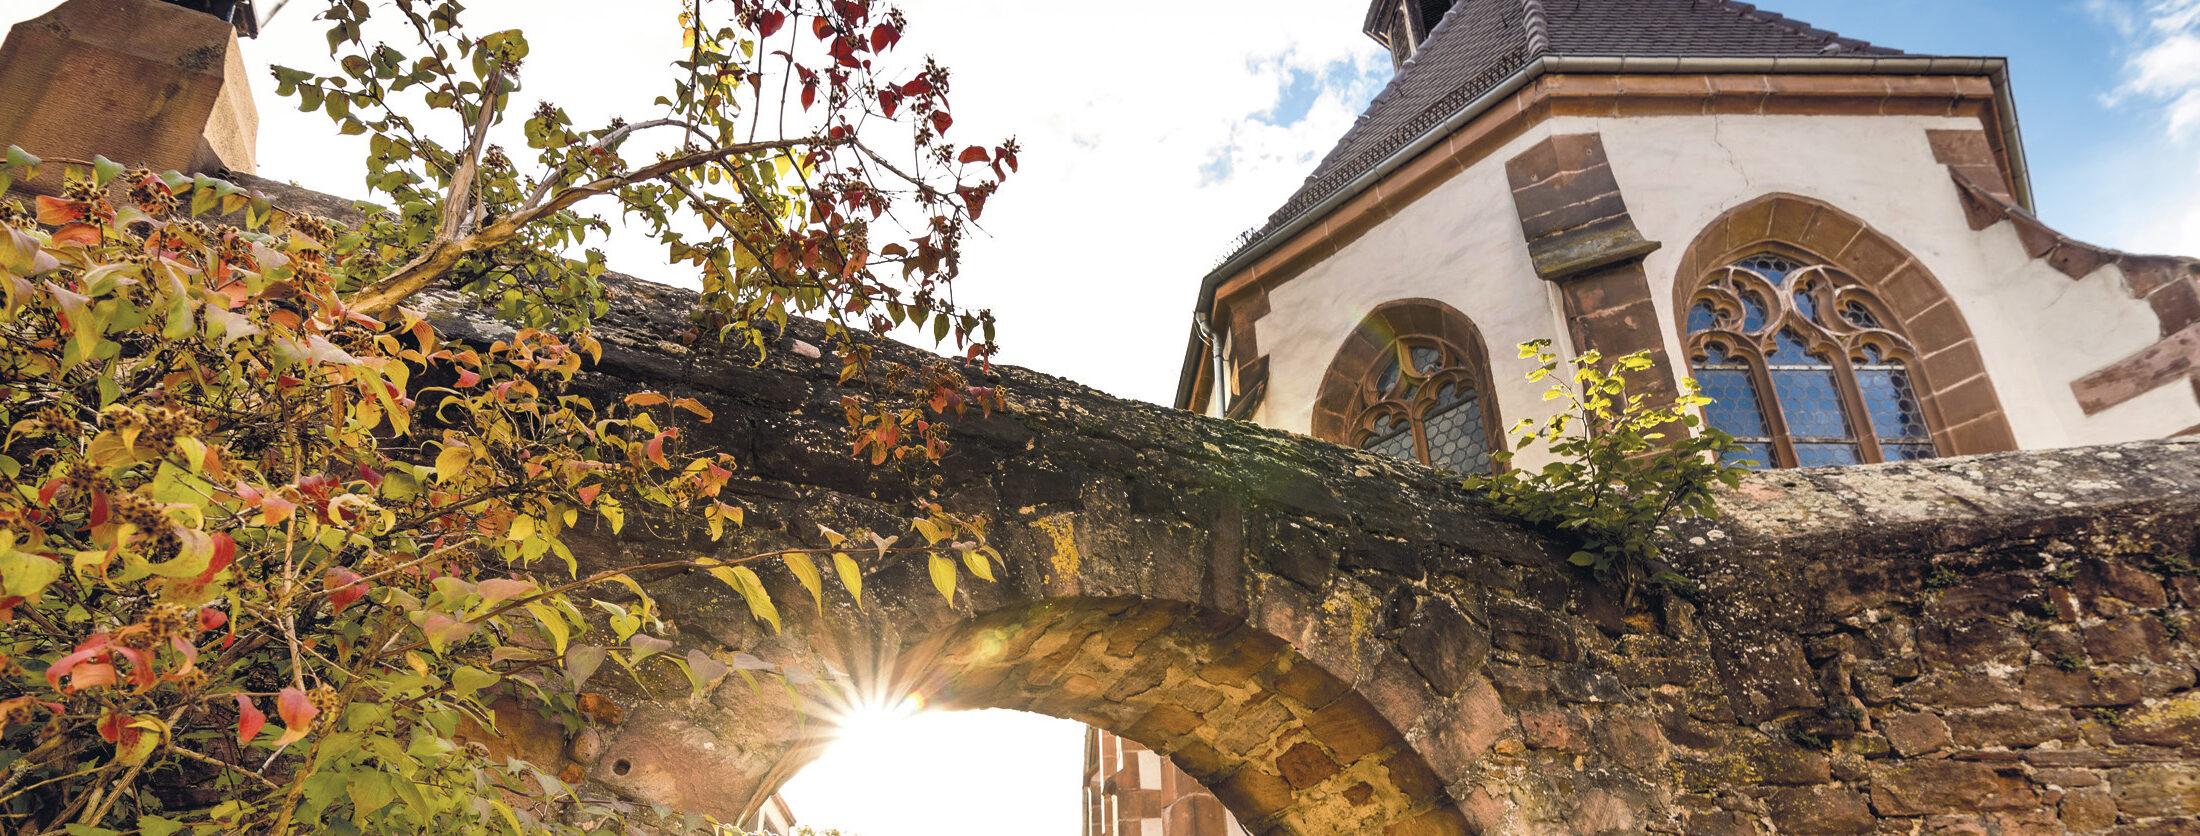 die_bergstrasse_tourismus-service-bergstrasse_titelbild_stadte_kultur_traube_ladenburg_neu